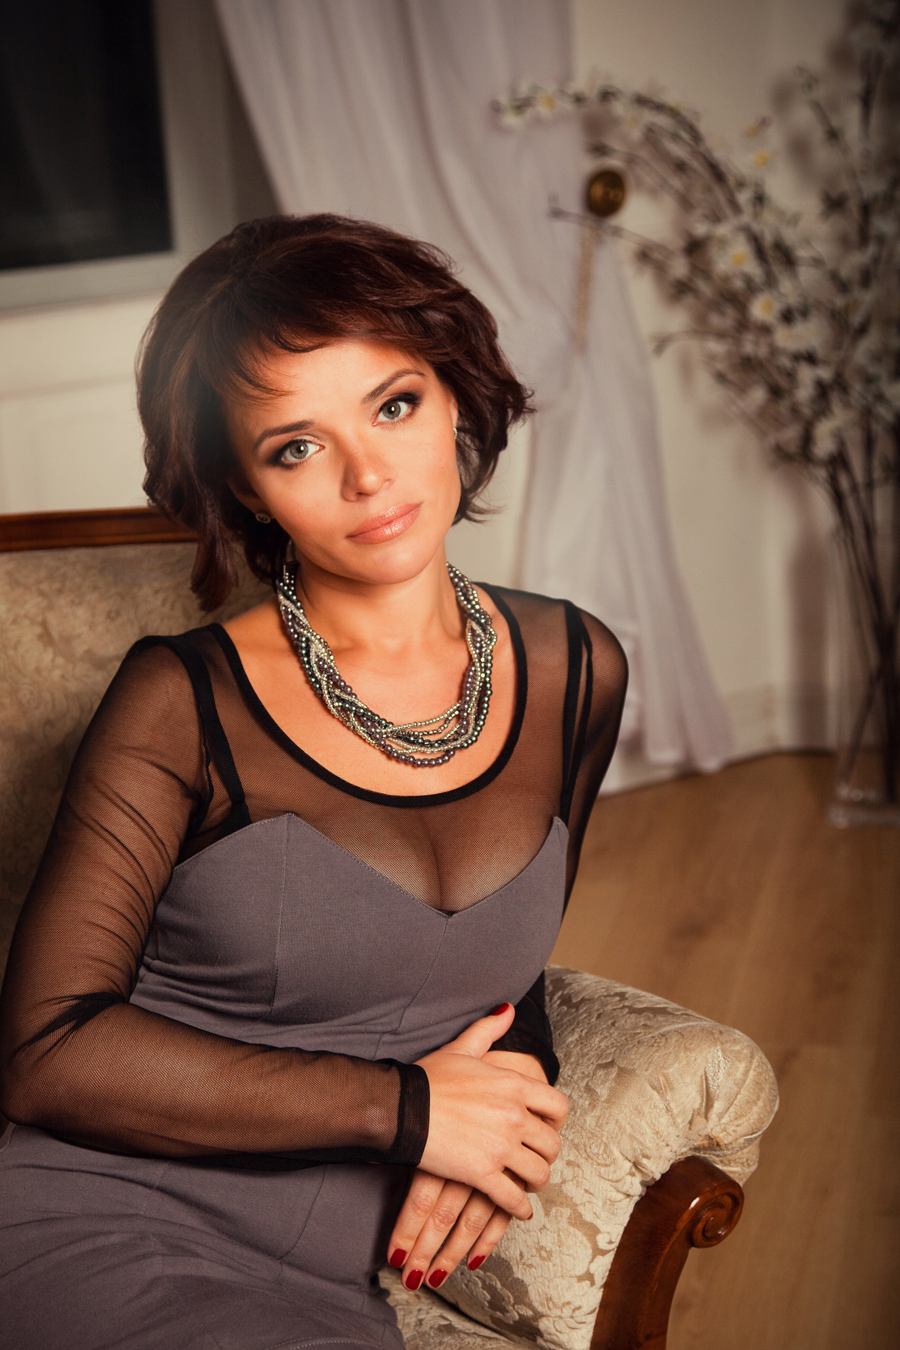 Agence femme russe